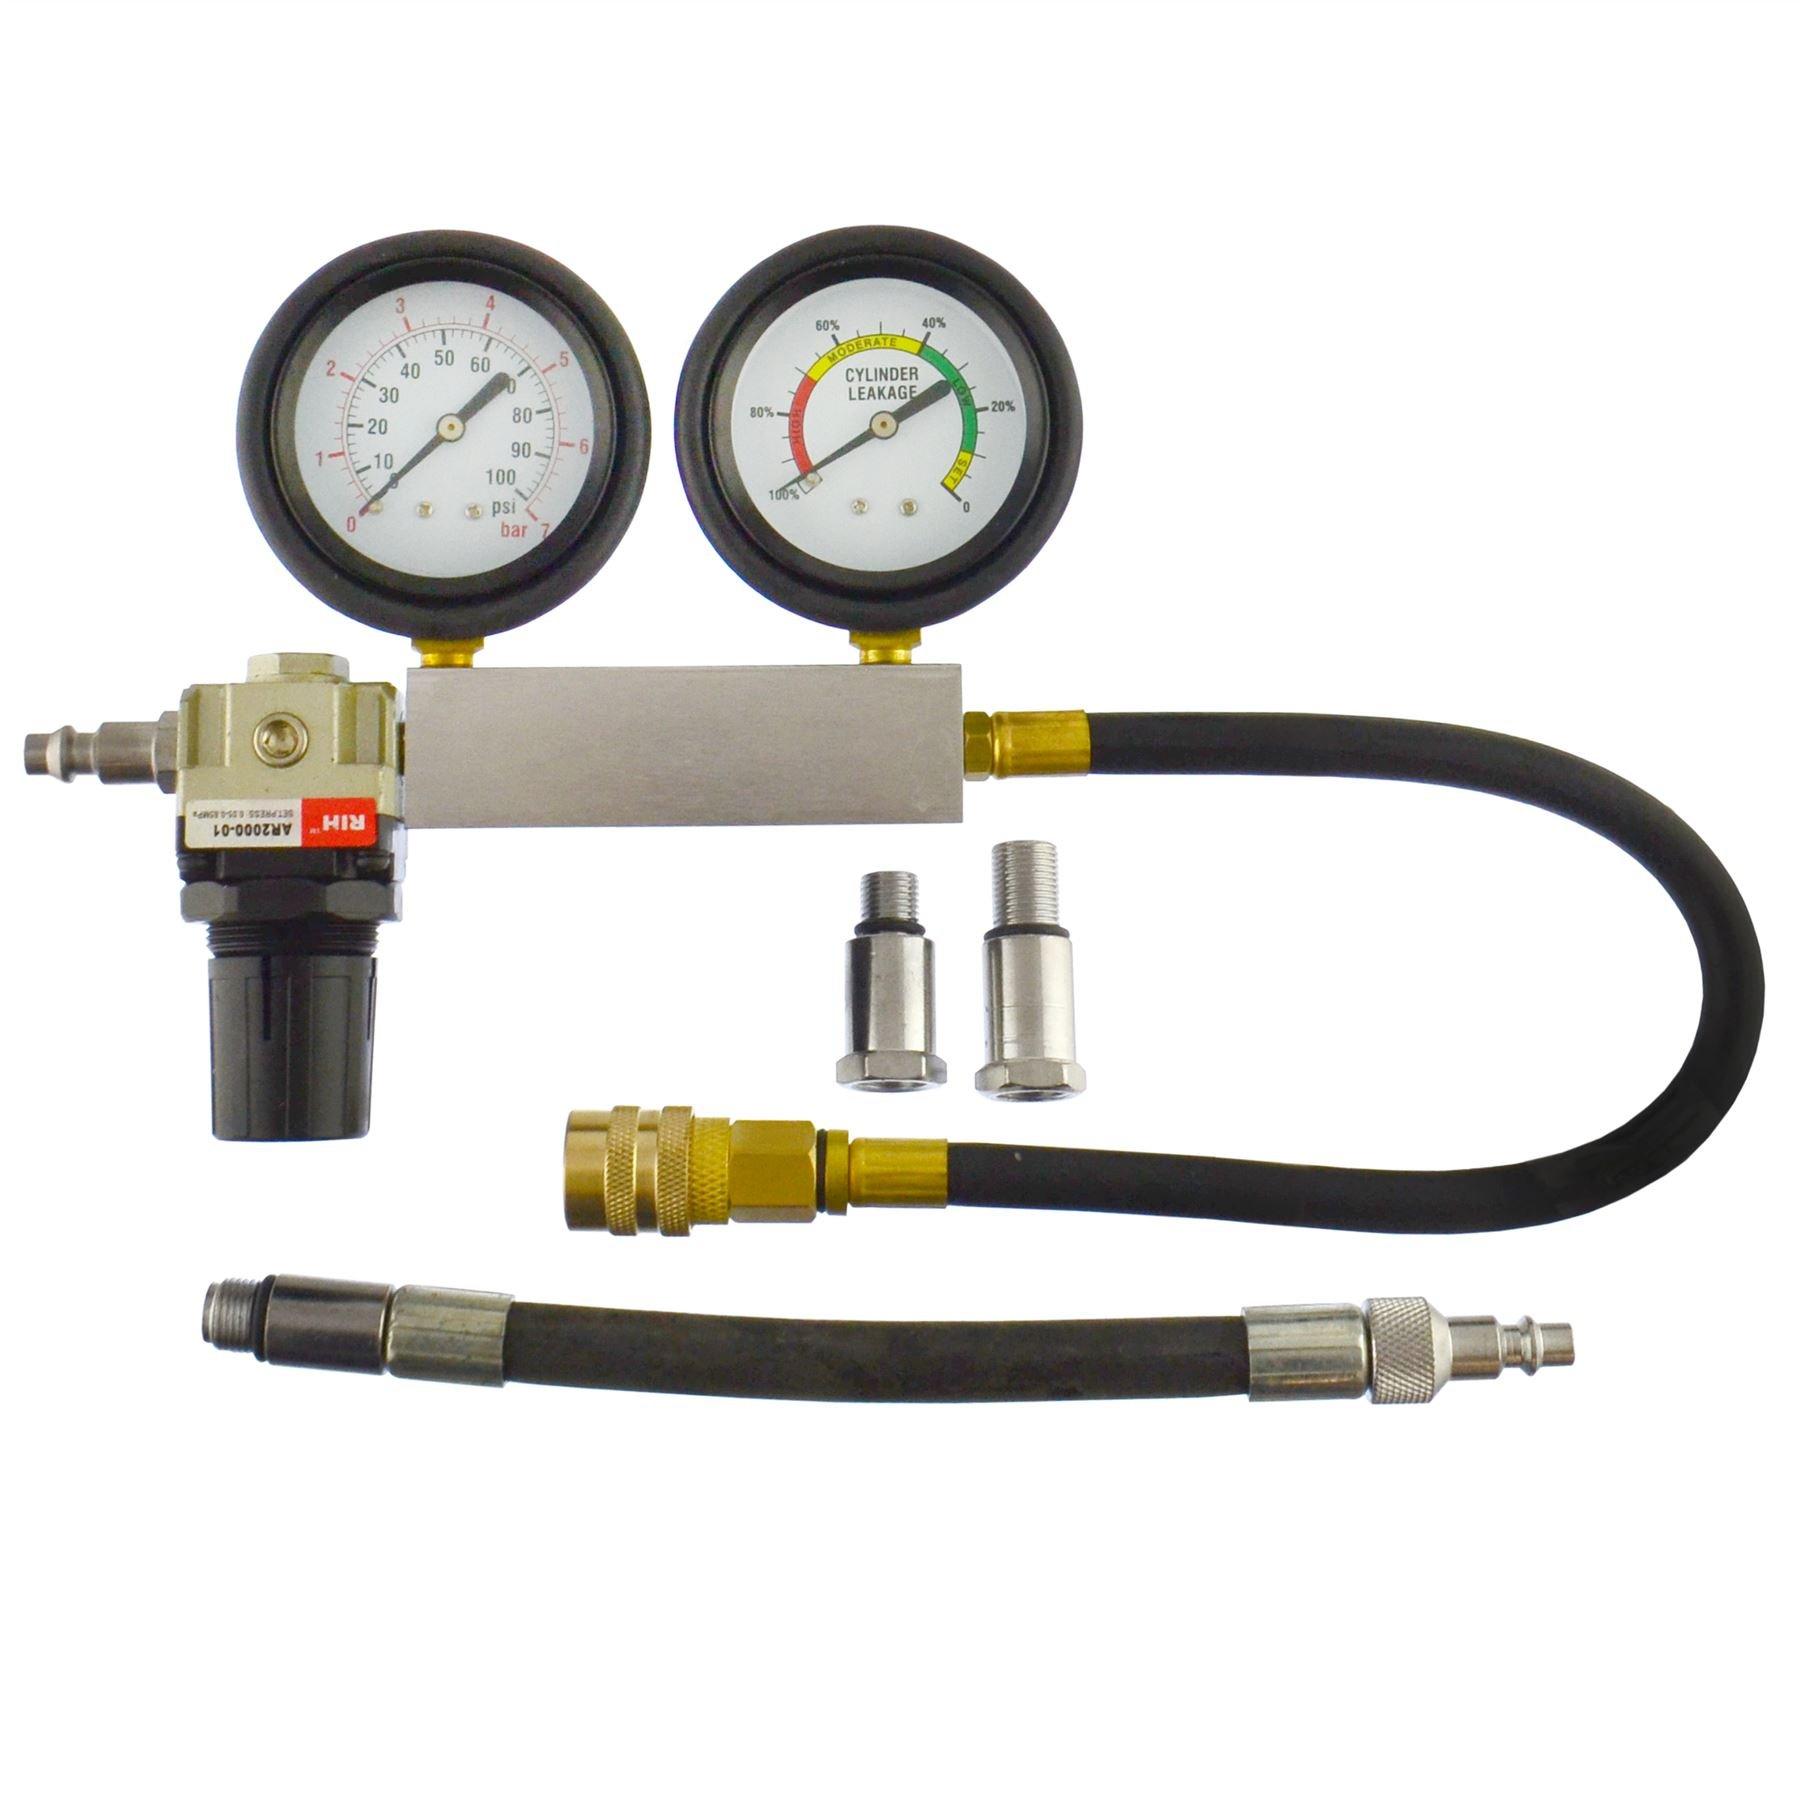 AB Tools-US Pro Cylinder Leak Detector/Tester Compression Leakage kit Set Petrol Engines AT270 by AB Tools-US Pro (Image #3)